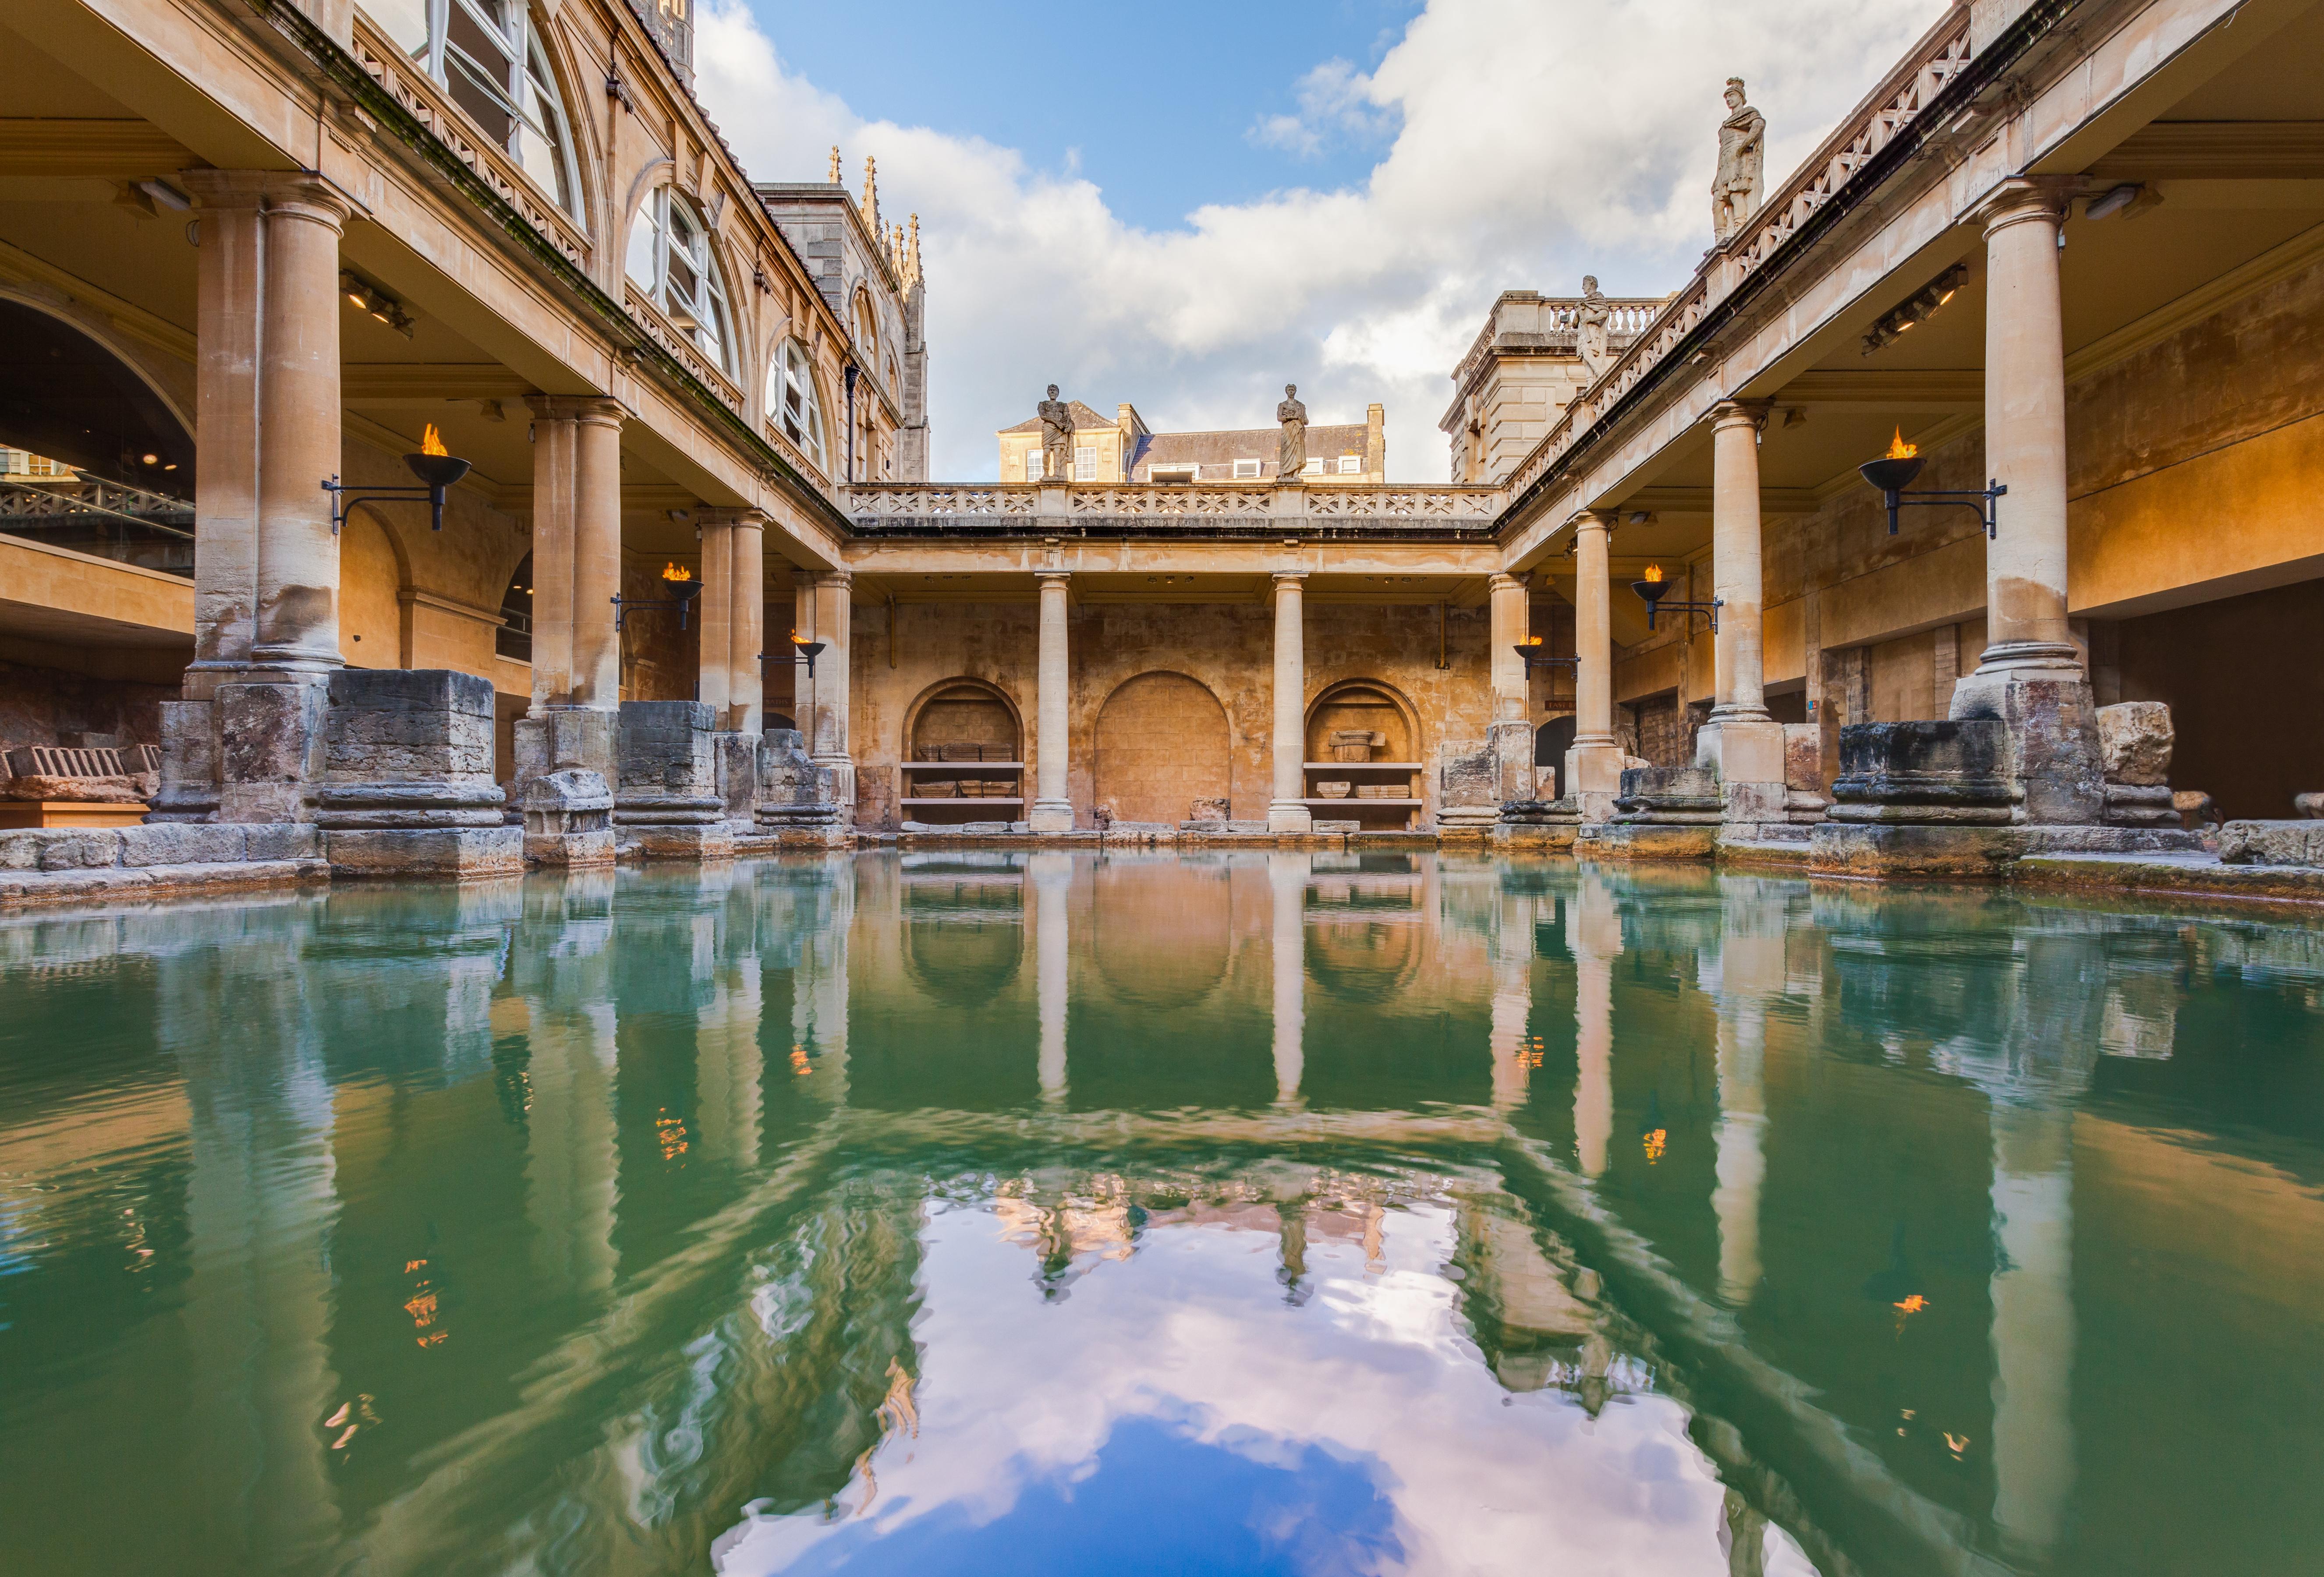 baños romanos 2